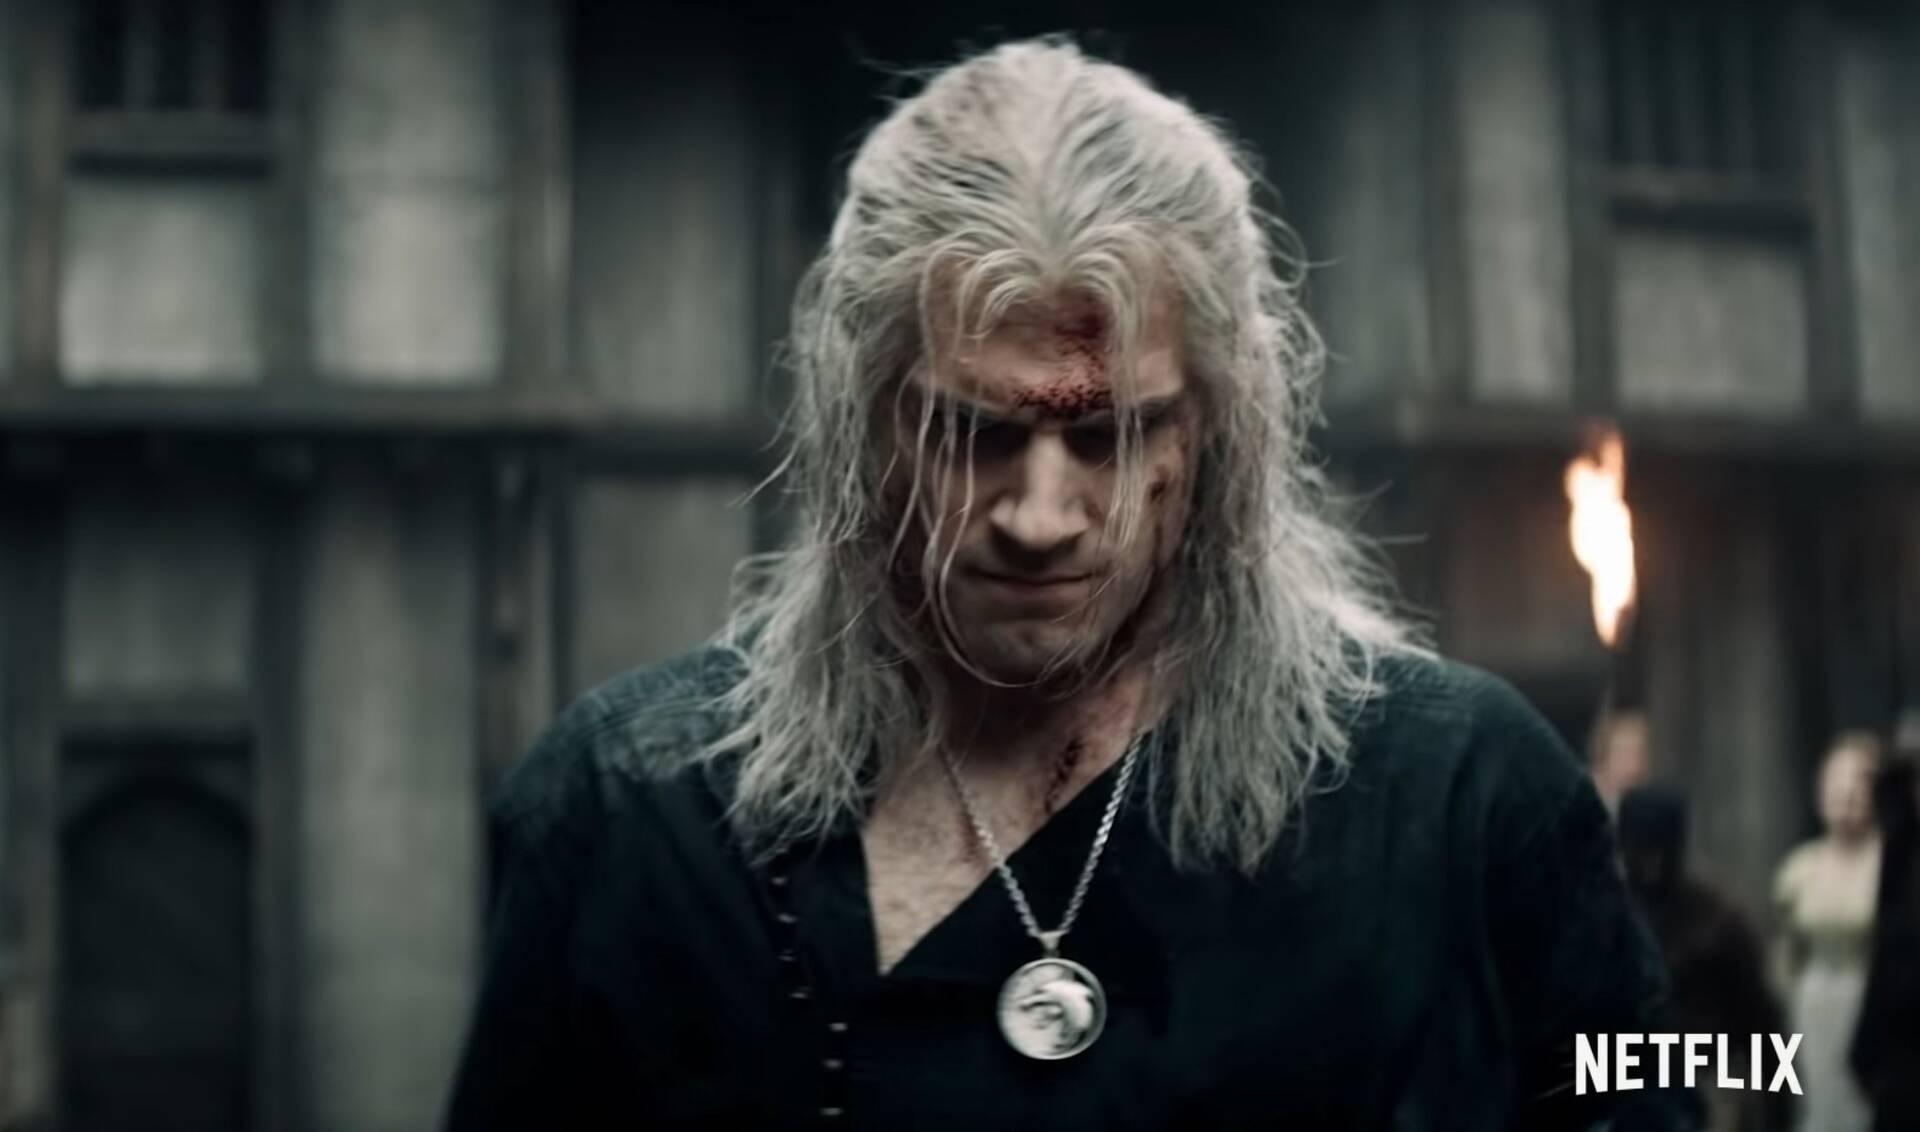 The Witcher de Netflix tendrá referencias al meme de la bañera